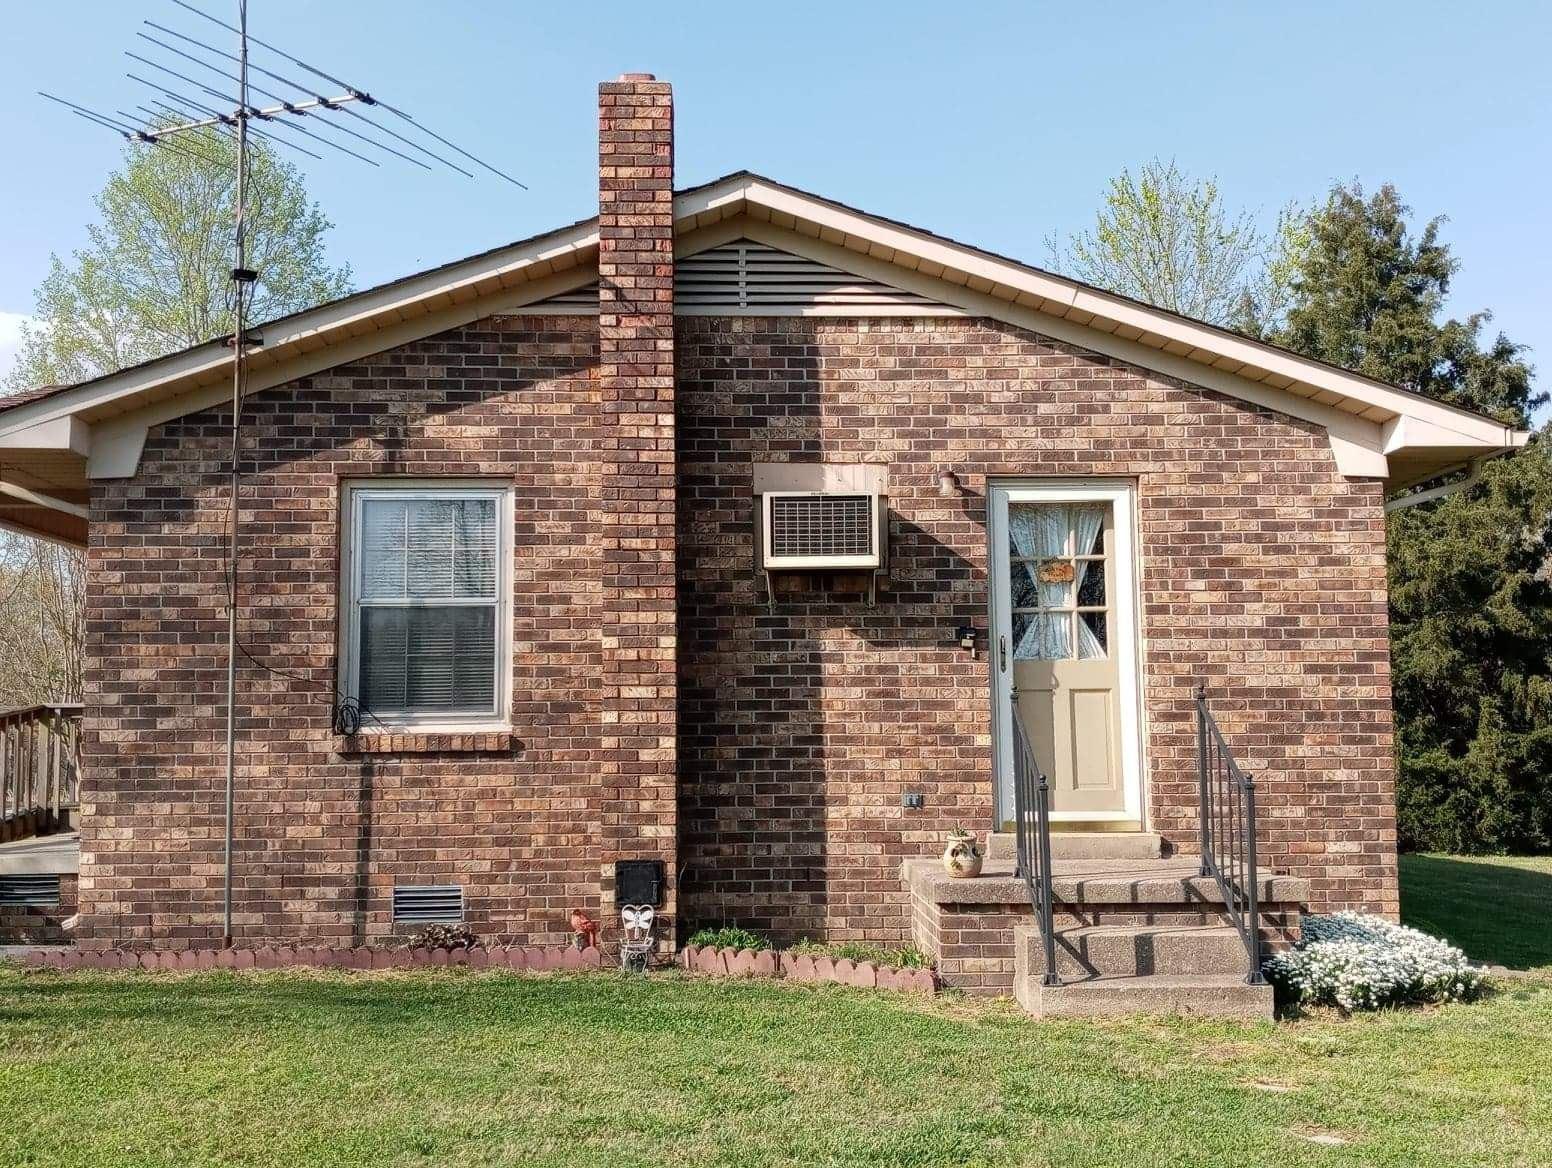 Photo of 790 Turnpike Rd W, Lawrenceburg, TN 38464 (MLS # 2243505)